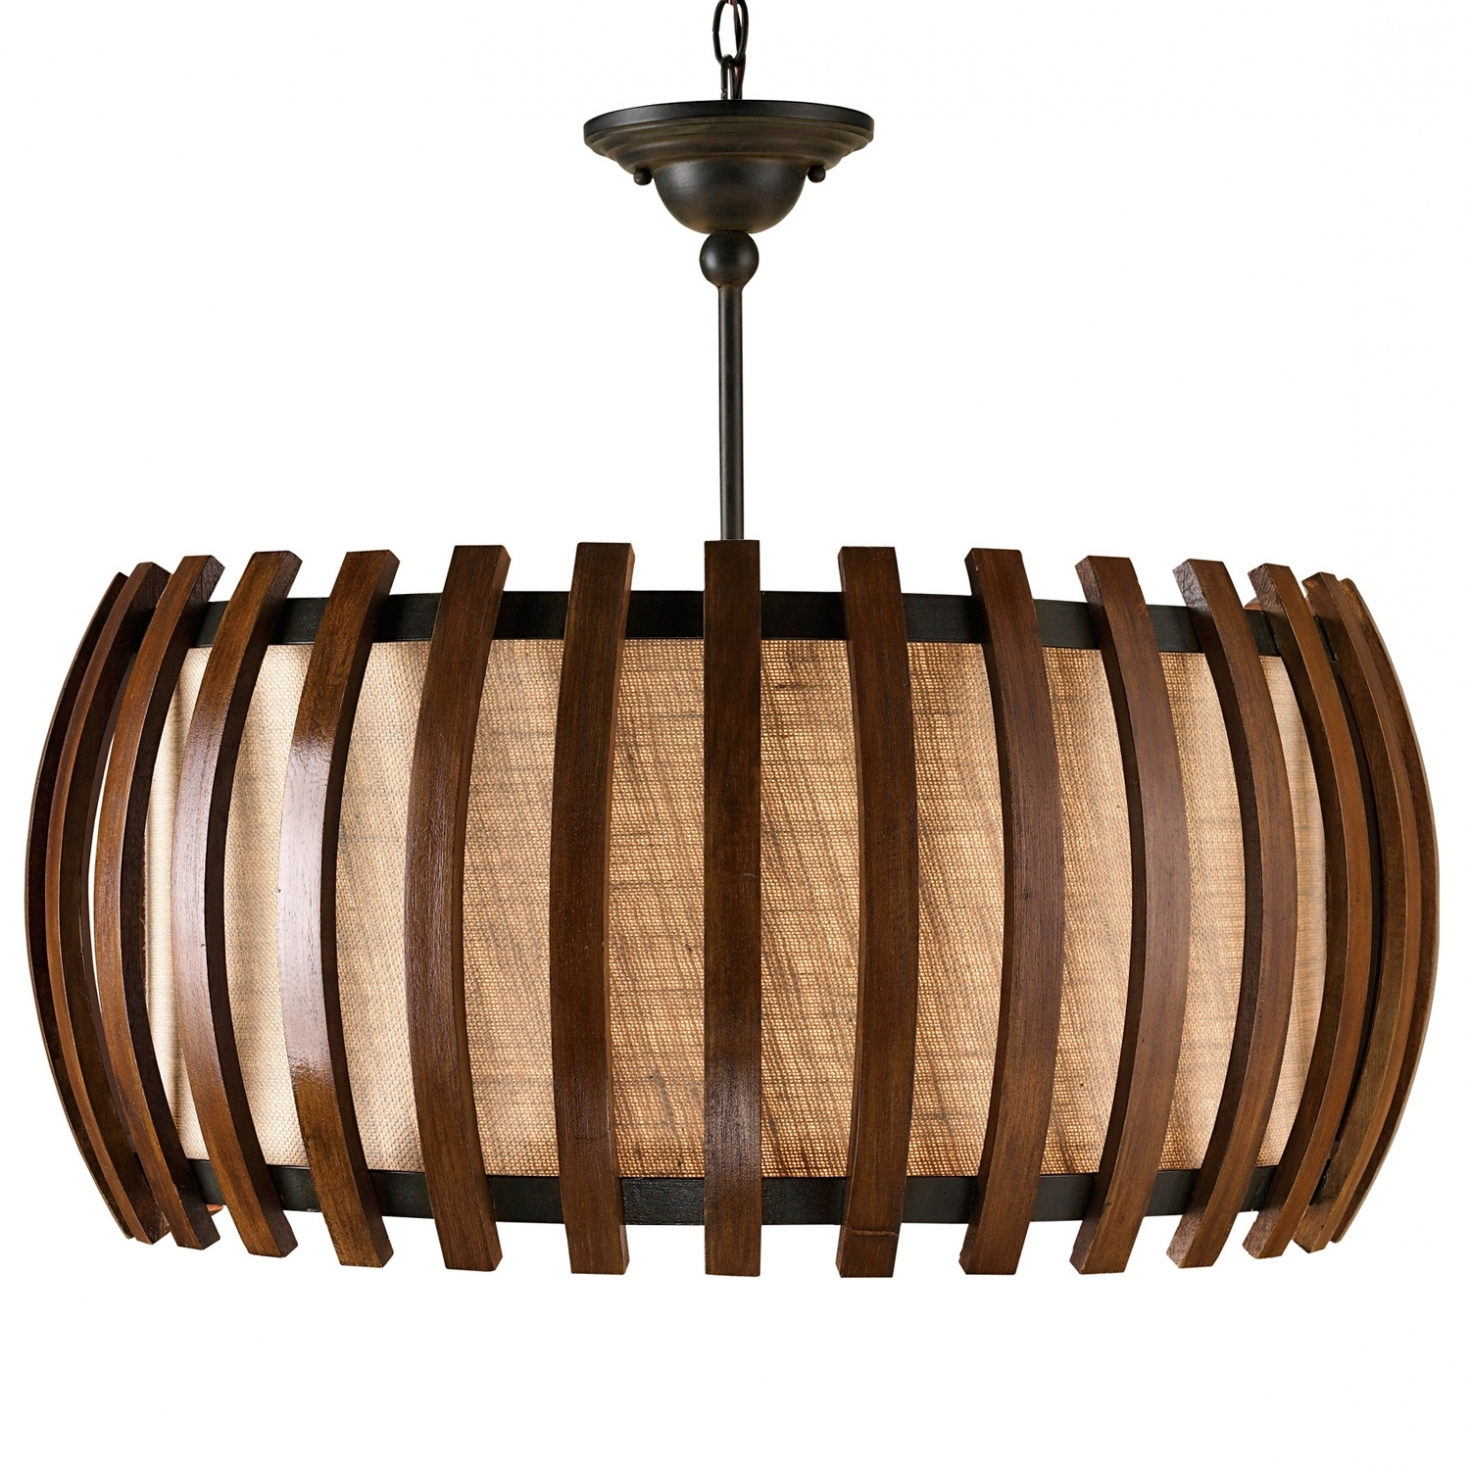 Modern Wooden Chandeliers – Chandelier Designs For 2018 Wooden Chandeliers (View 4 of 15)